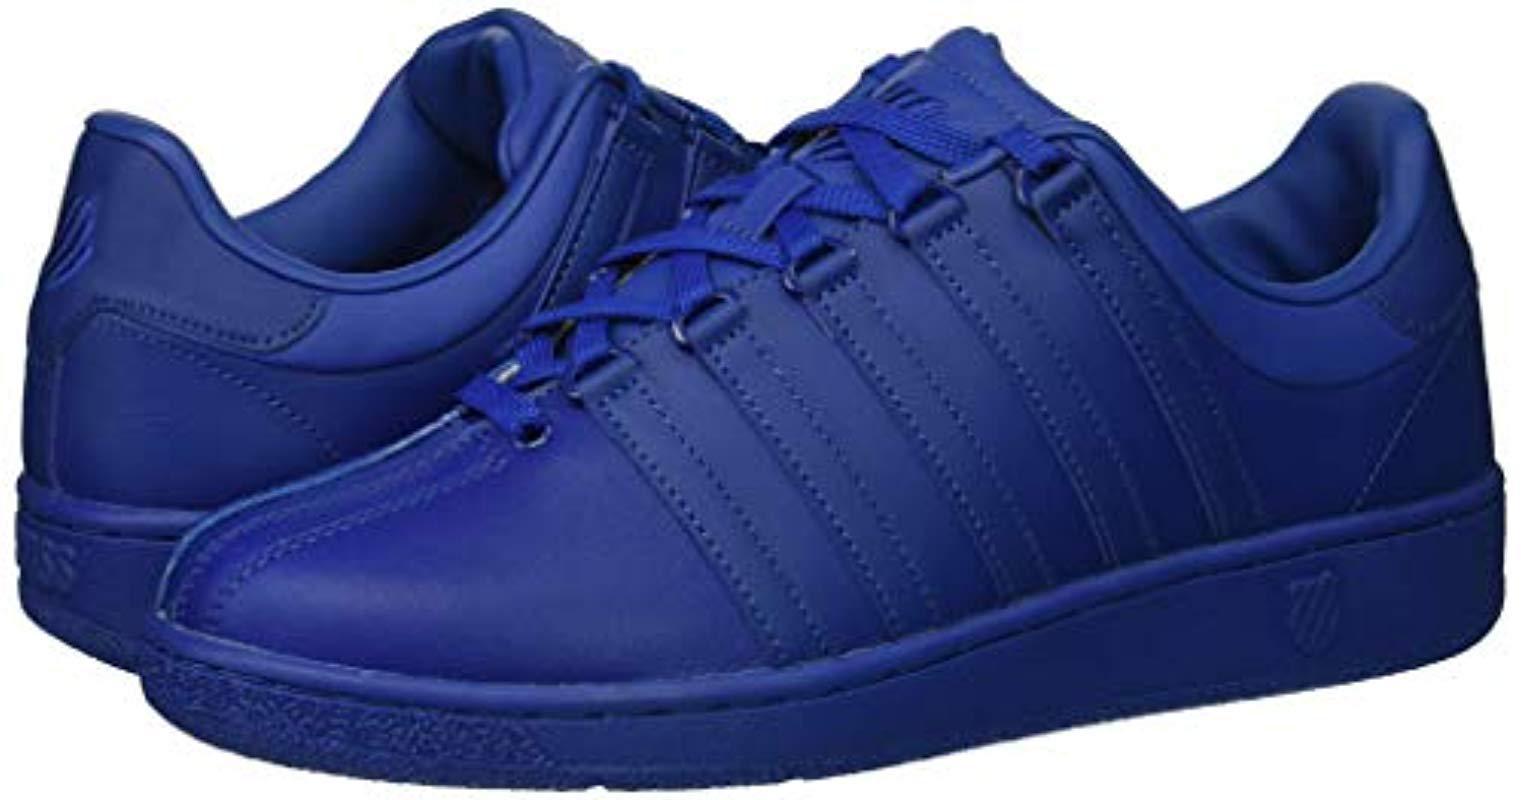 afa65ff875d603 Lyst - K-swiss Classic Vn Sneaker in Blue for Men - Save 20%